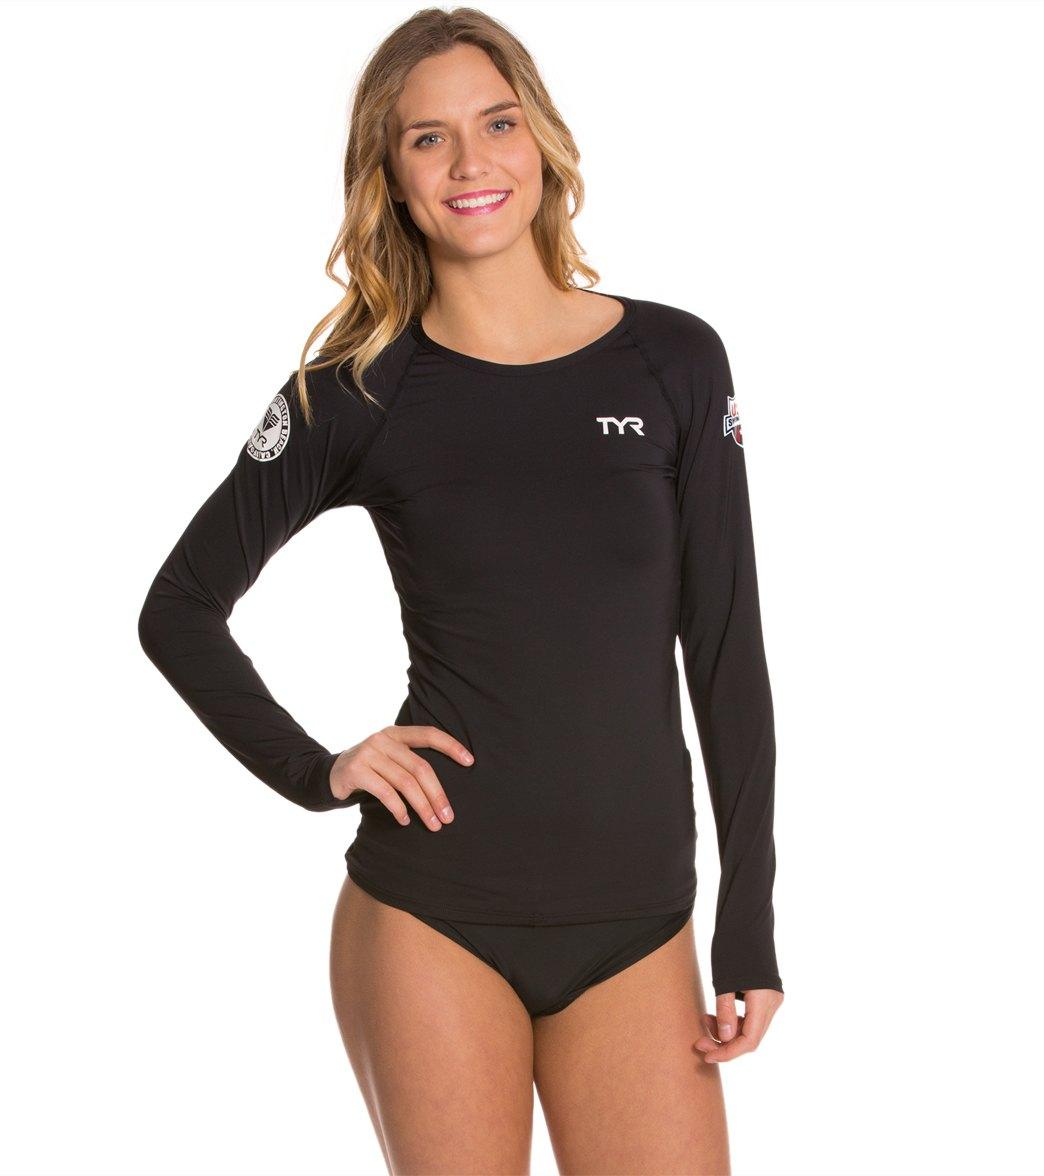 ca5c3de5 TYR USA Swimming Women's Long Sleeve Swim Shirt at SwimOutlet ...